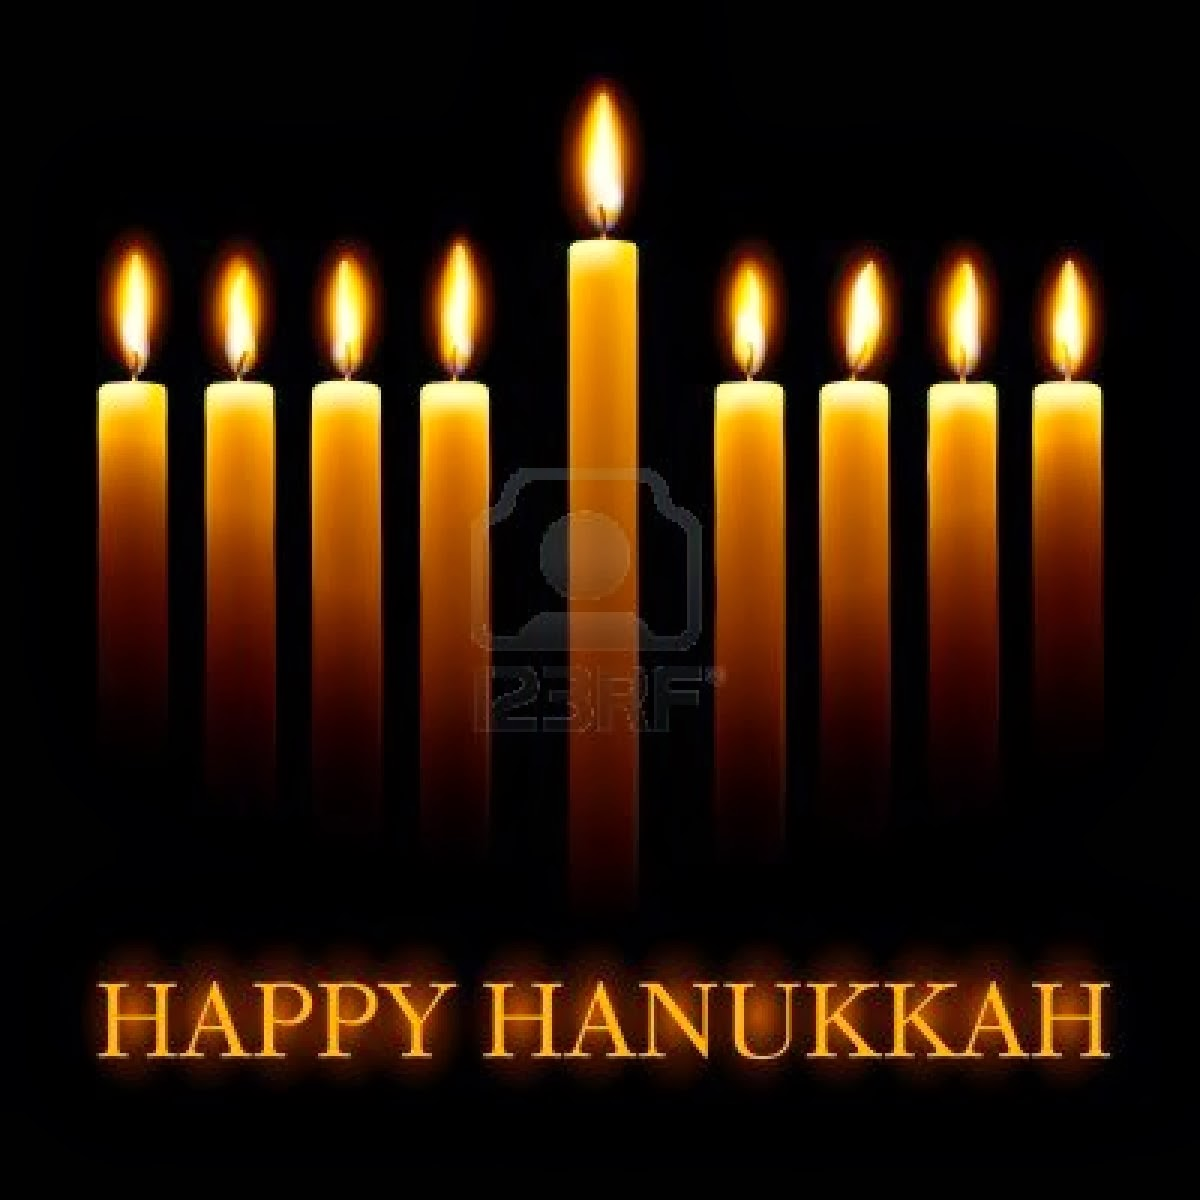 happy hanukkah authorstream - photo #22